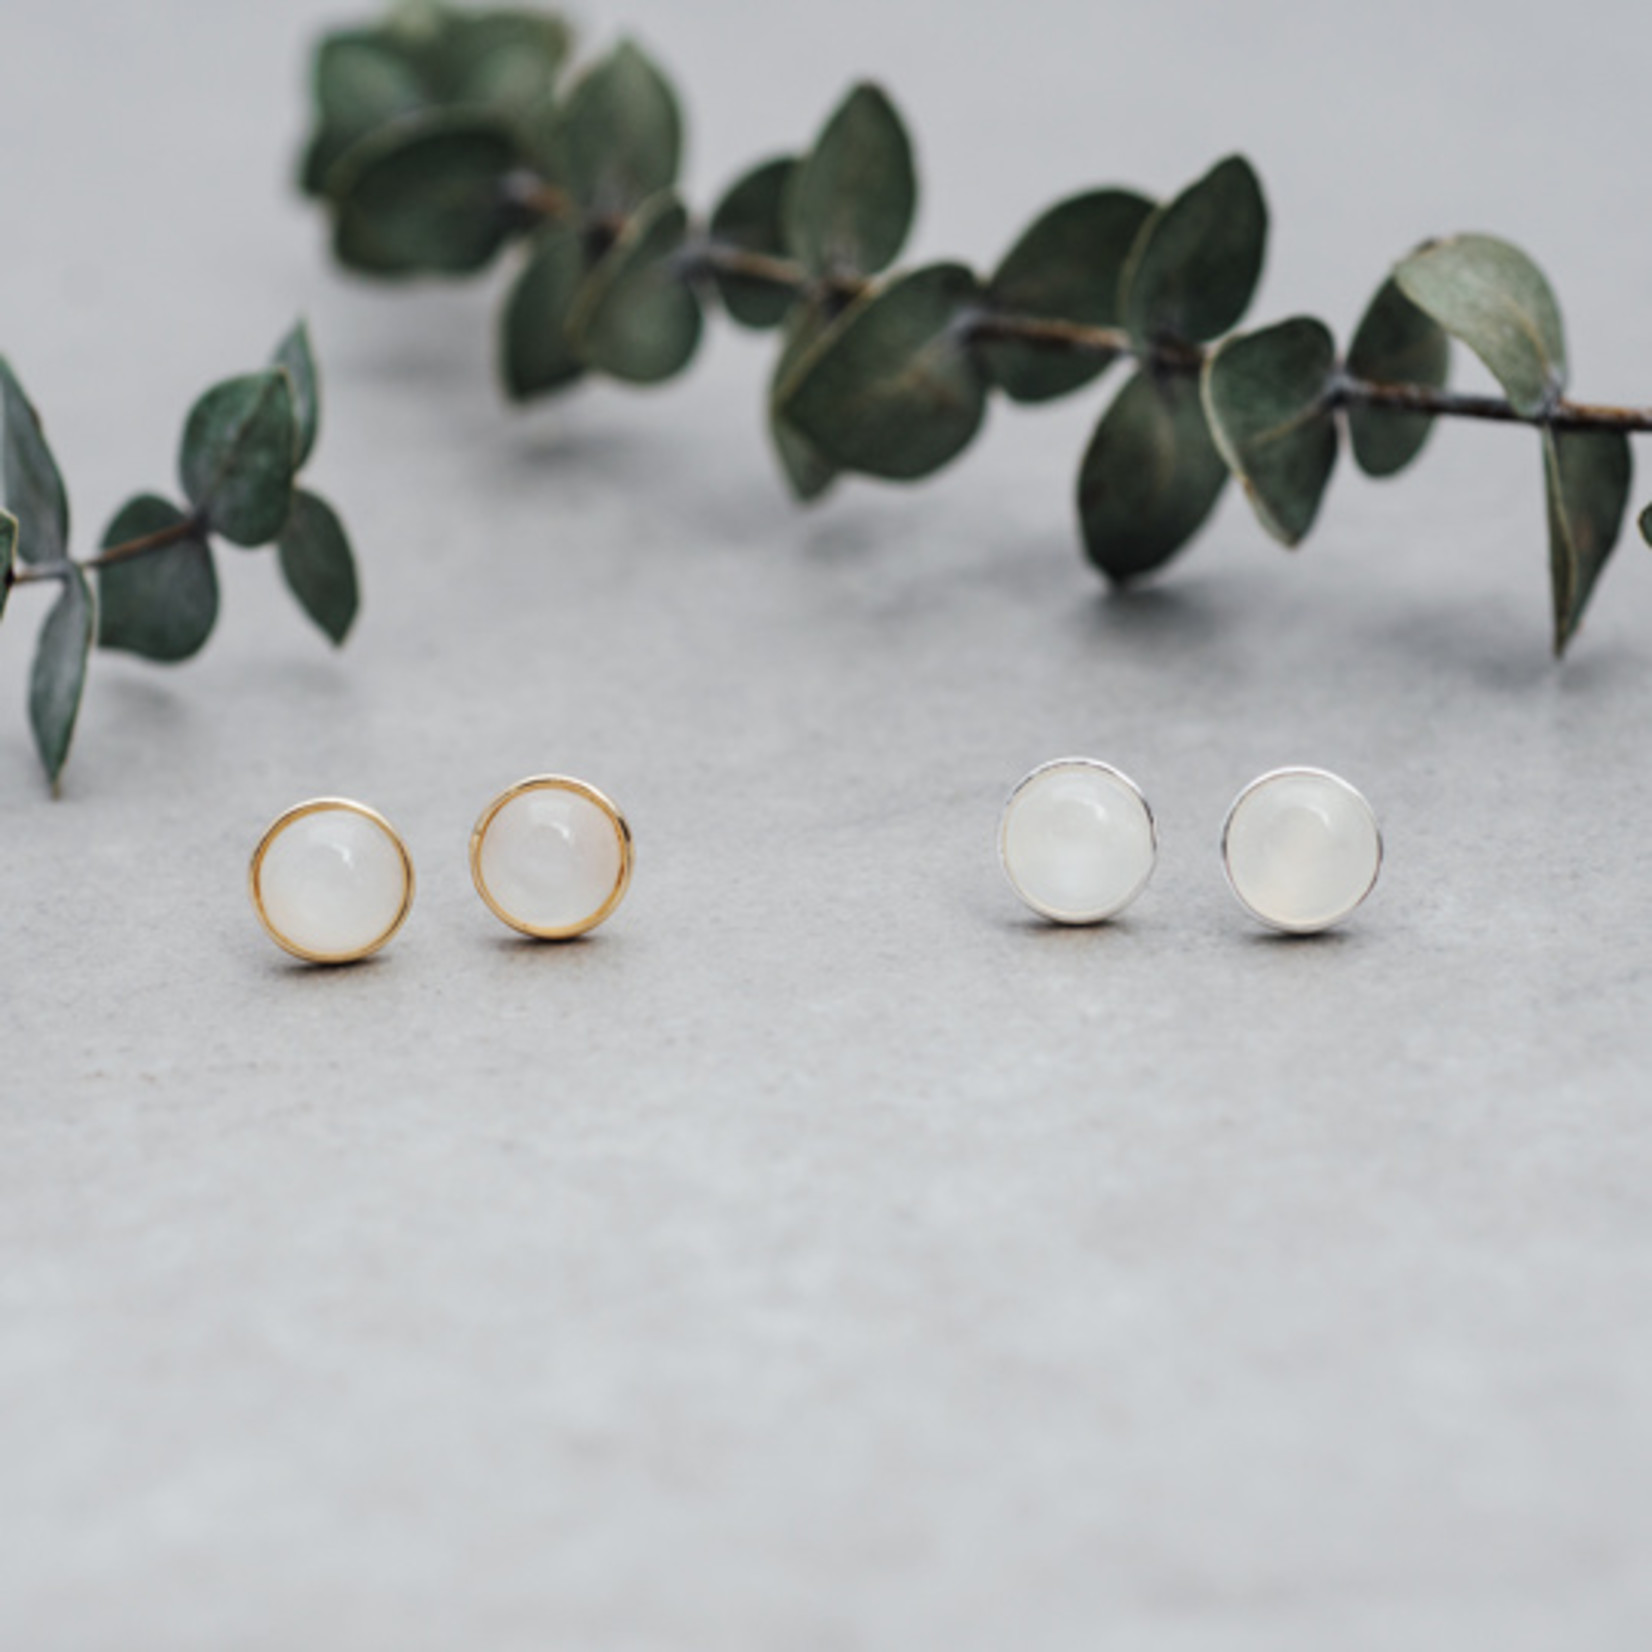 Anytime stud earrings - Moon stone